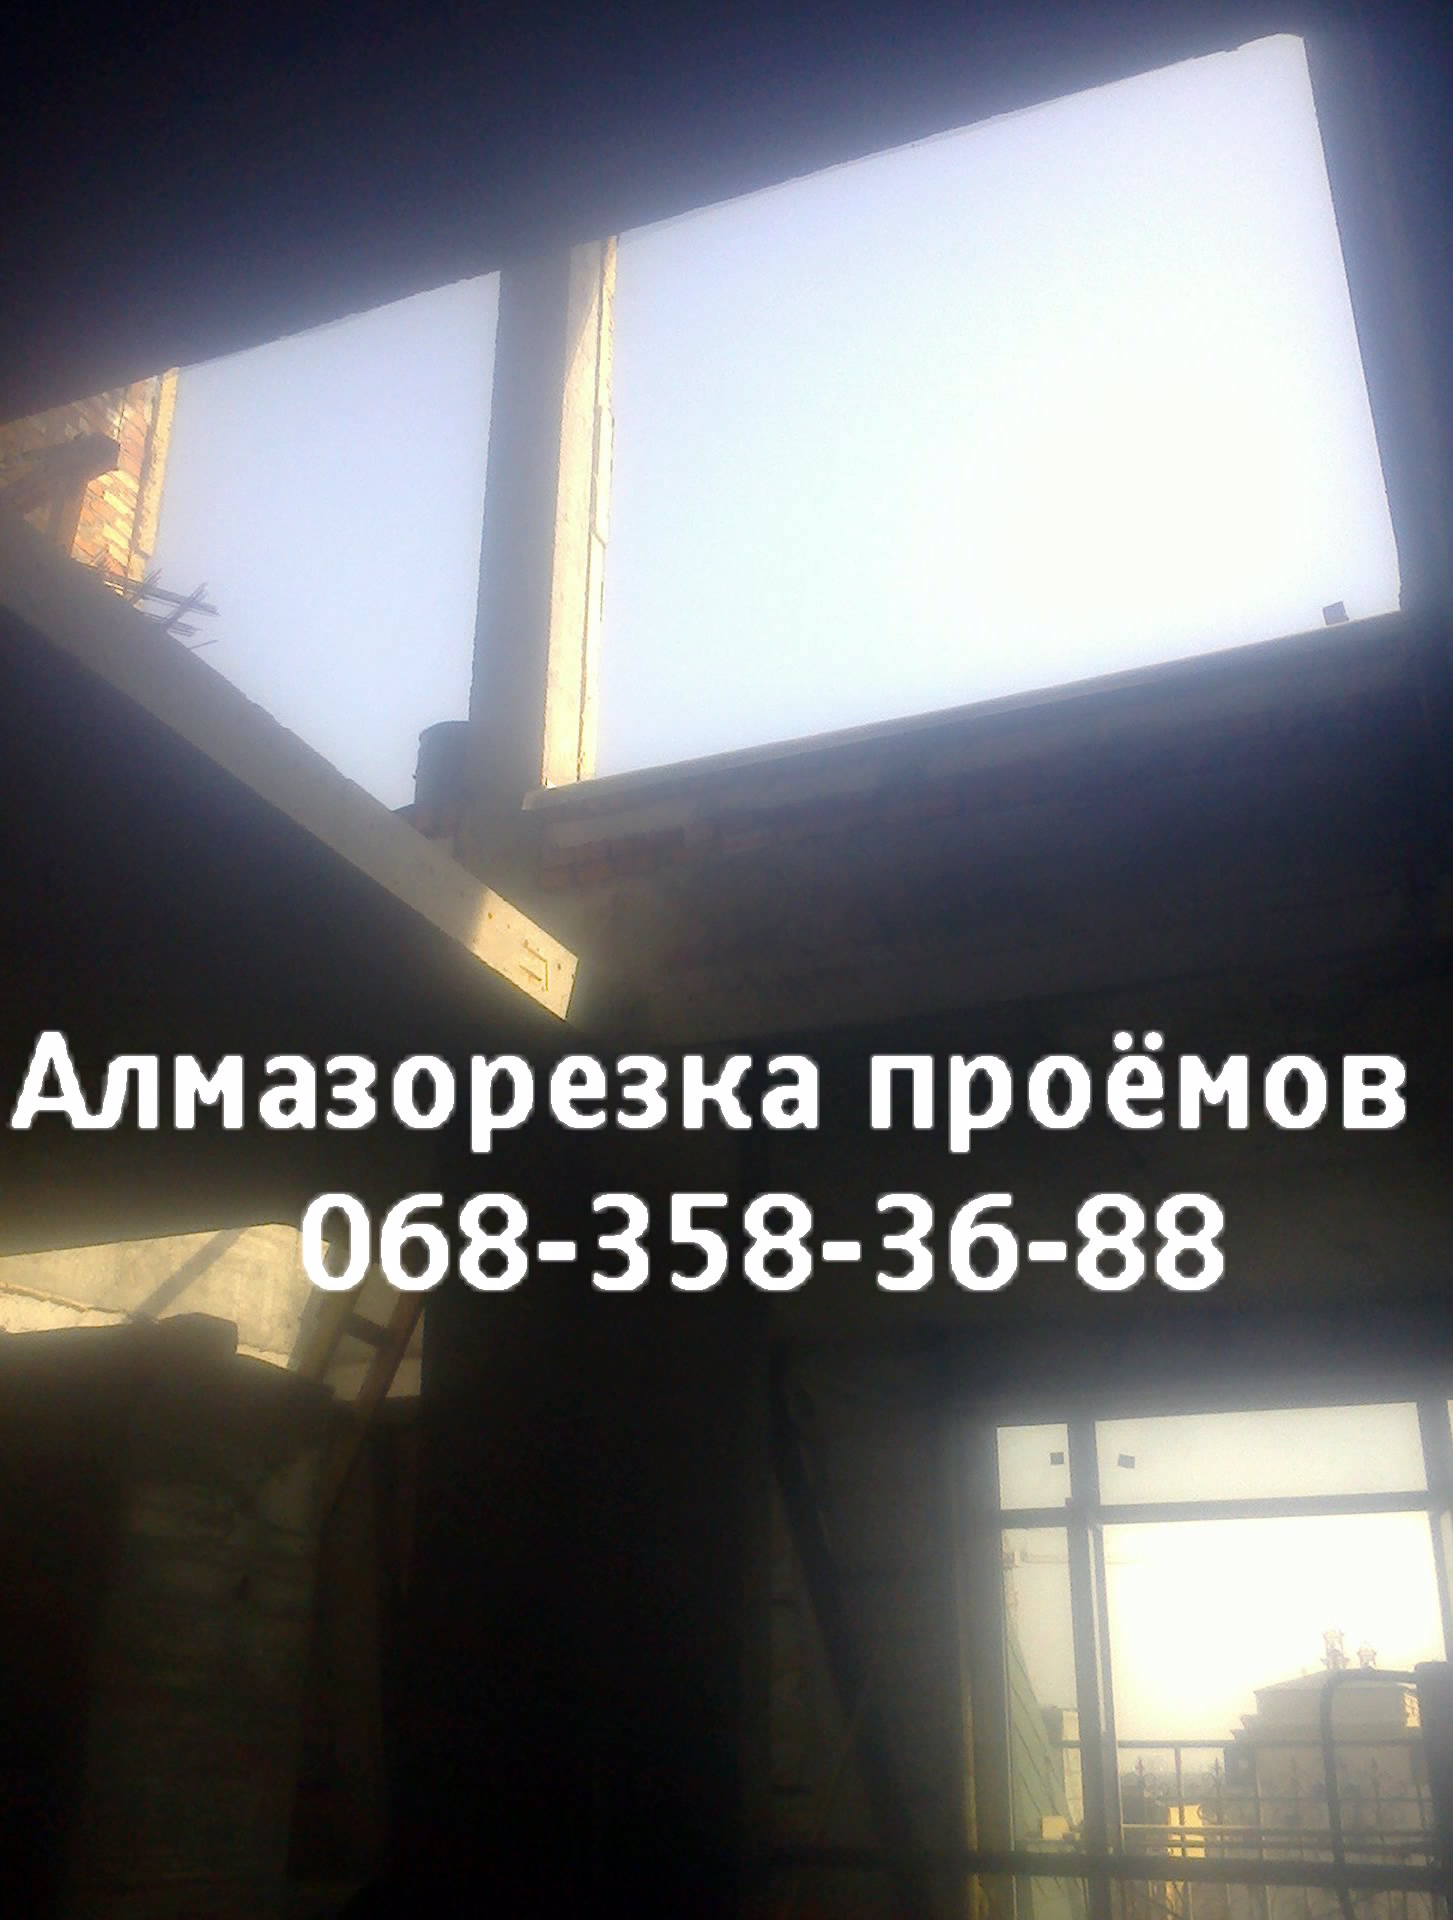 Нажмите на изображение для увеличения Название: Фото0603.jpg Просмотров: 9 Размер:216.7 Кб ID:595172